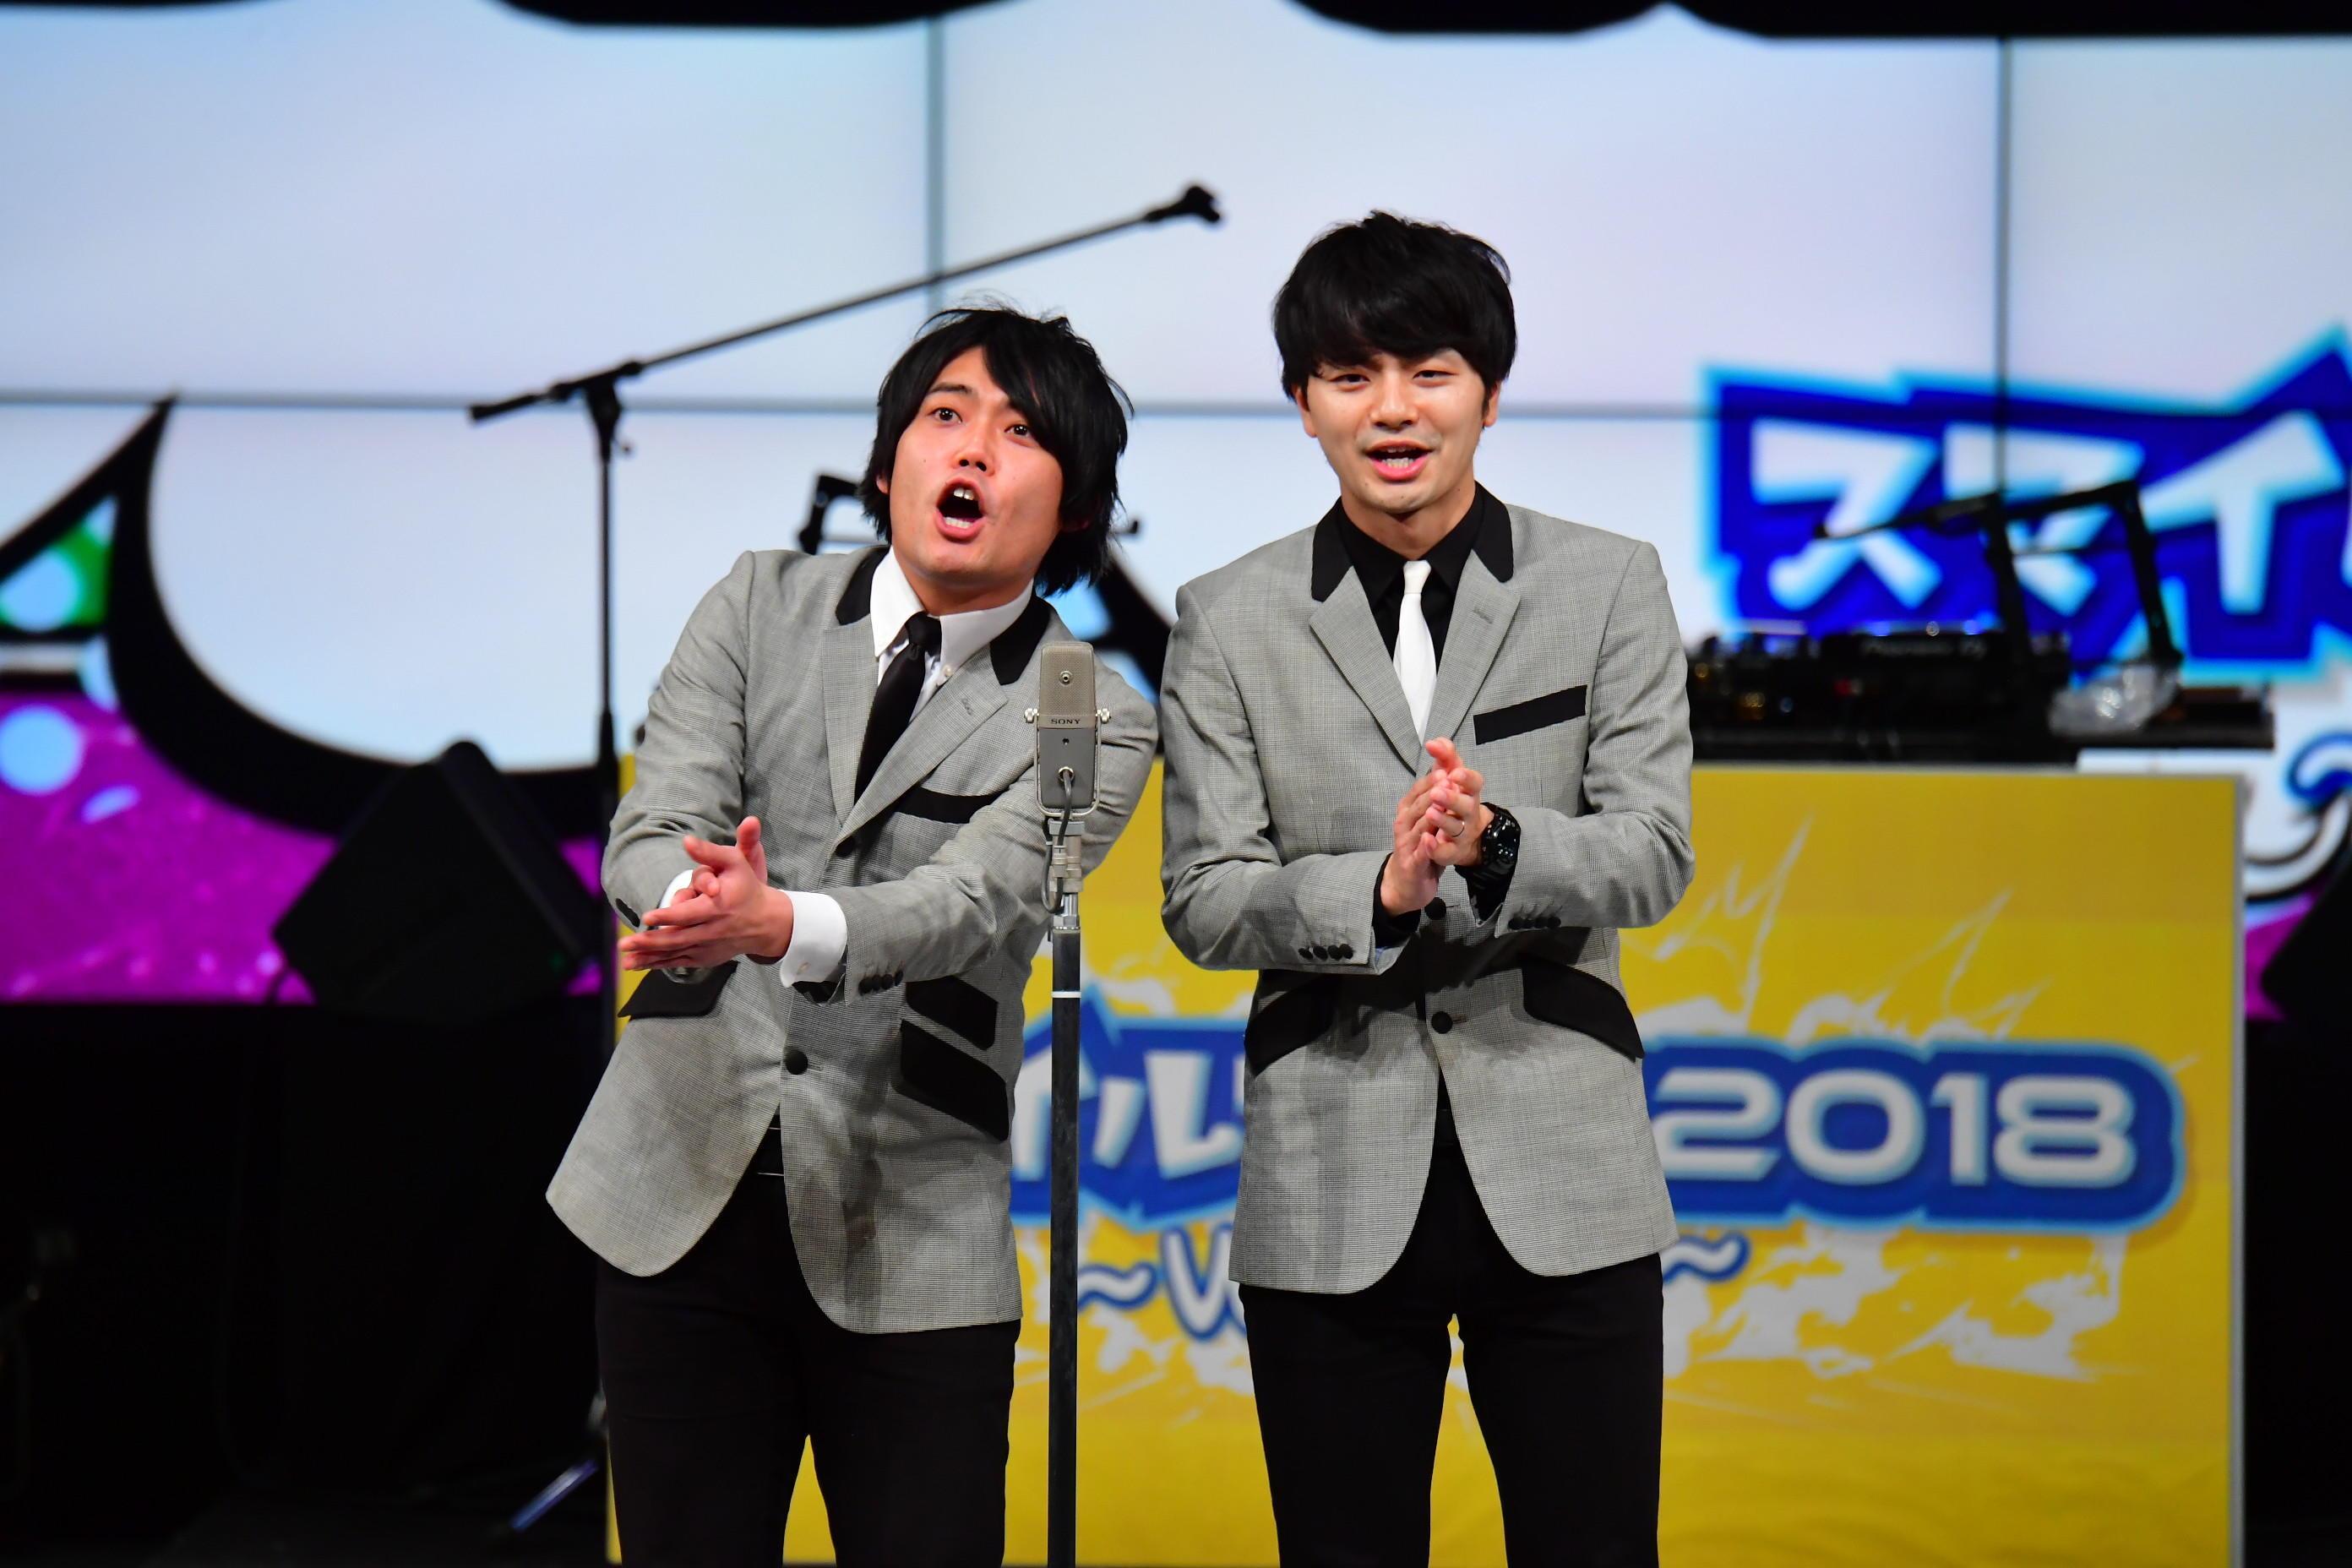 http://news.yoshimoto.co.jp/20180119012012-562e74d4ff195d25500e0905863cffdf11696dbe.jpg